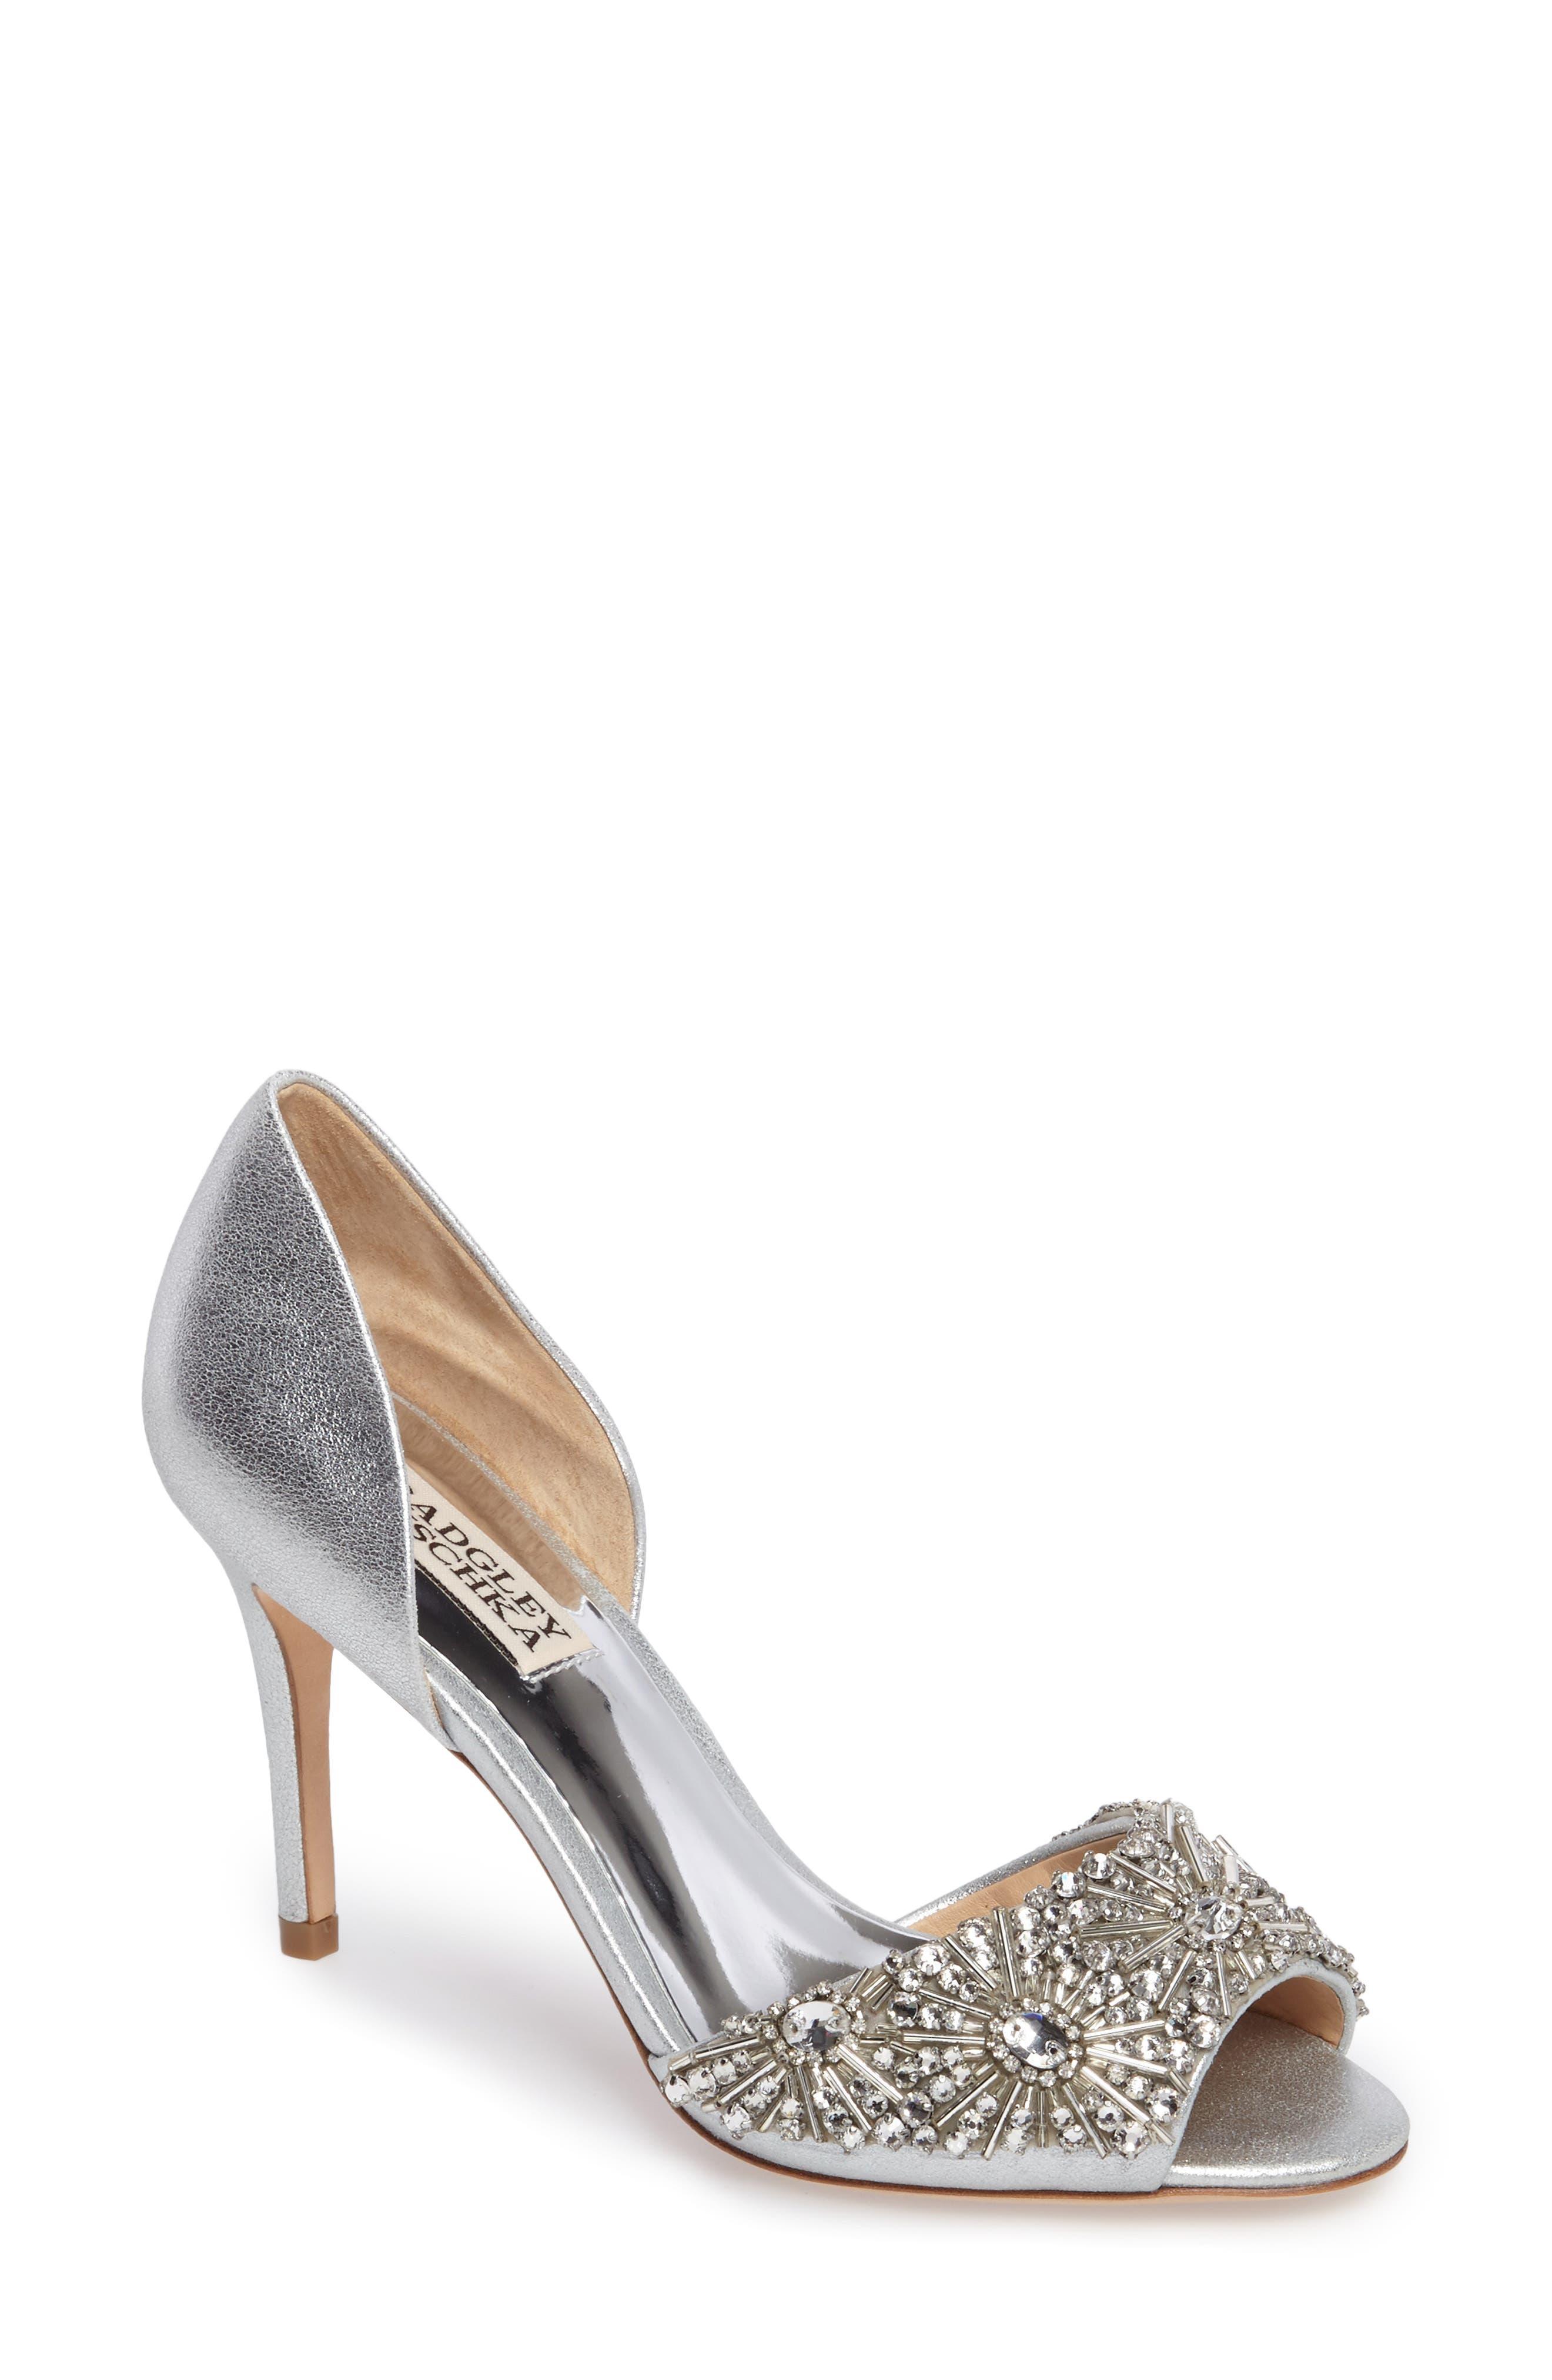 silver heels | Nordstrom